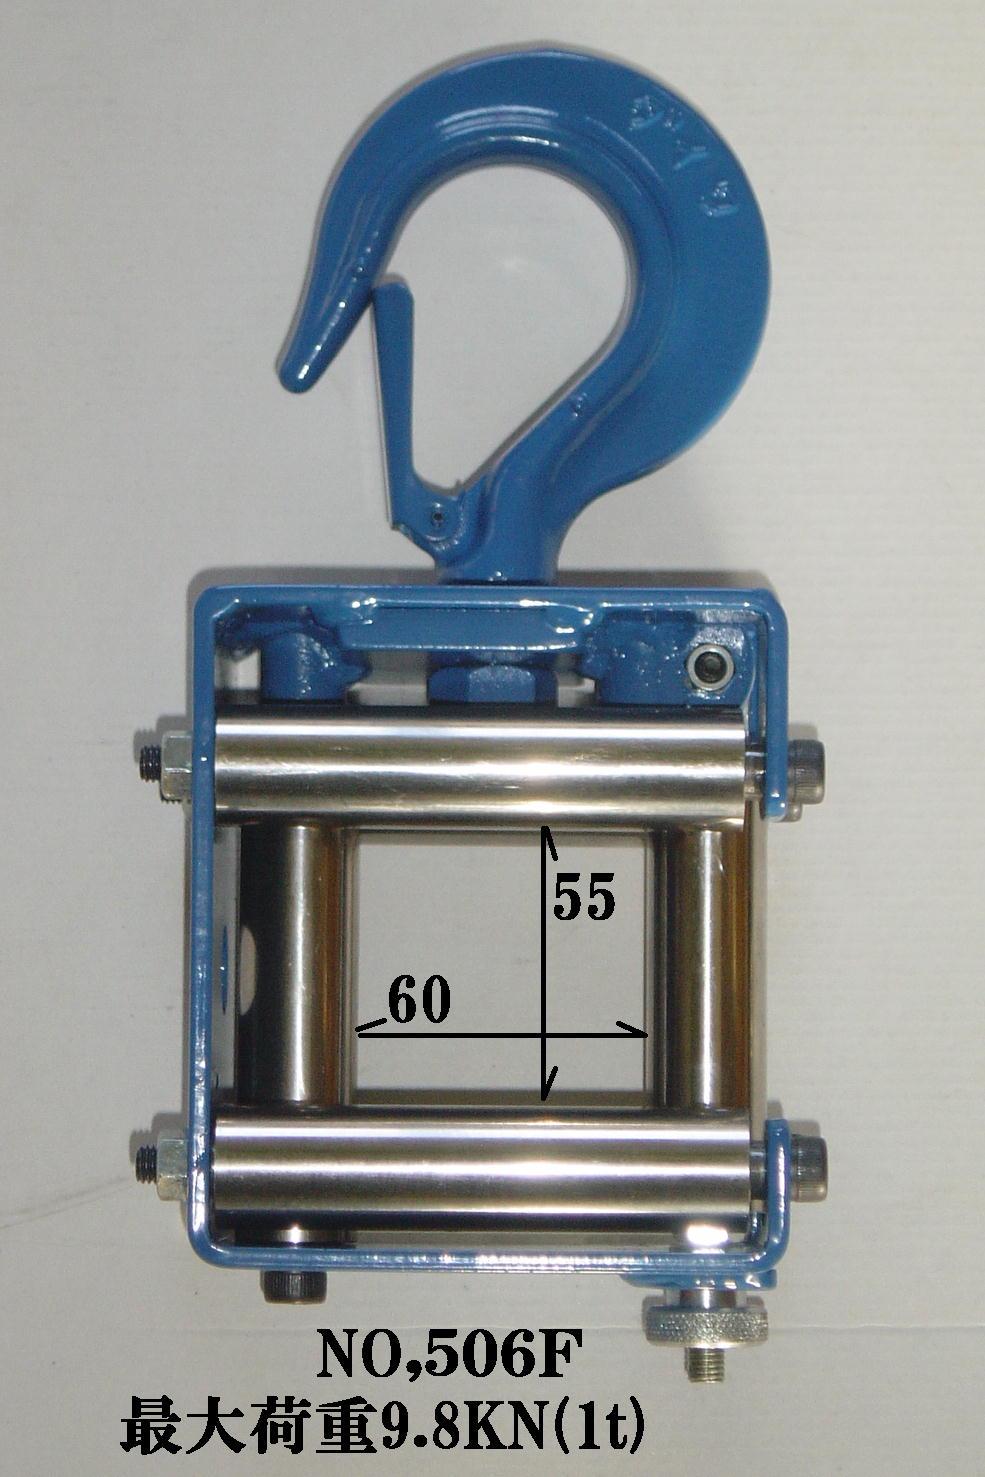 ダイワ 506f アルミ合金製釣車/電設工具 配管工具 空調工具 専門店